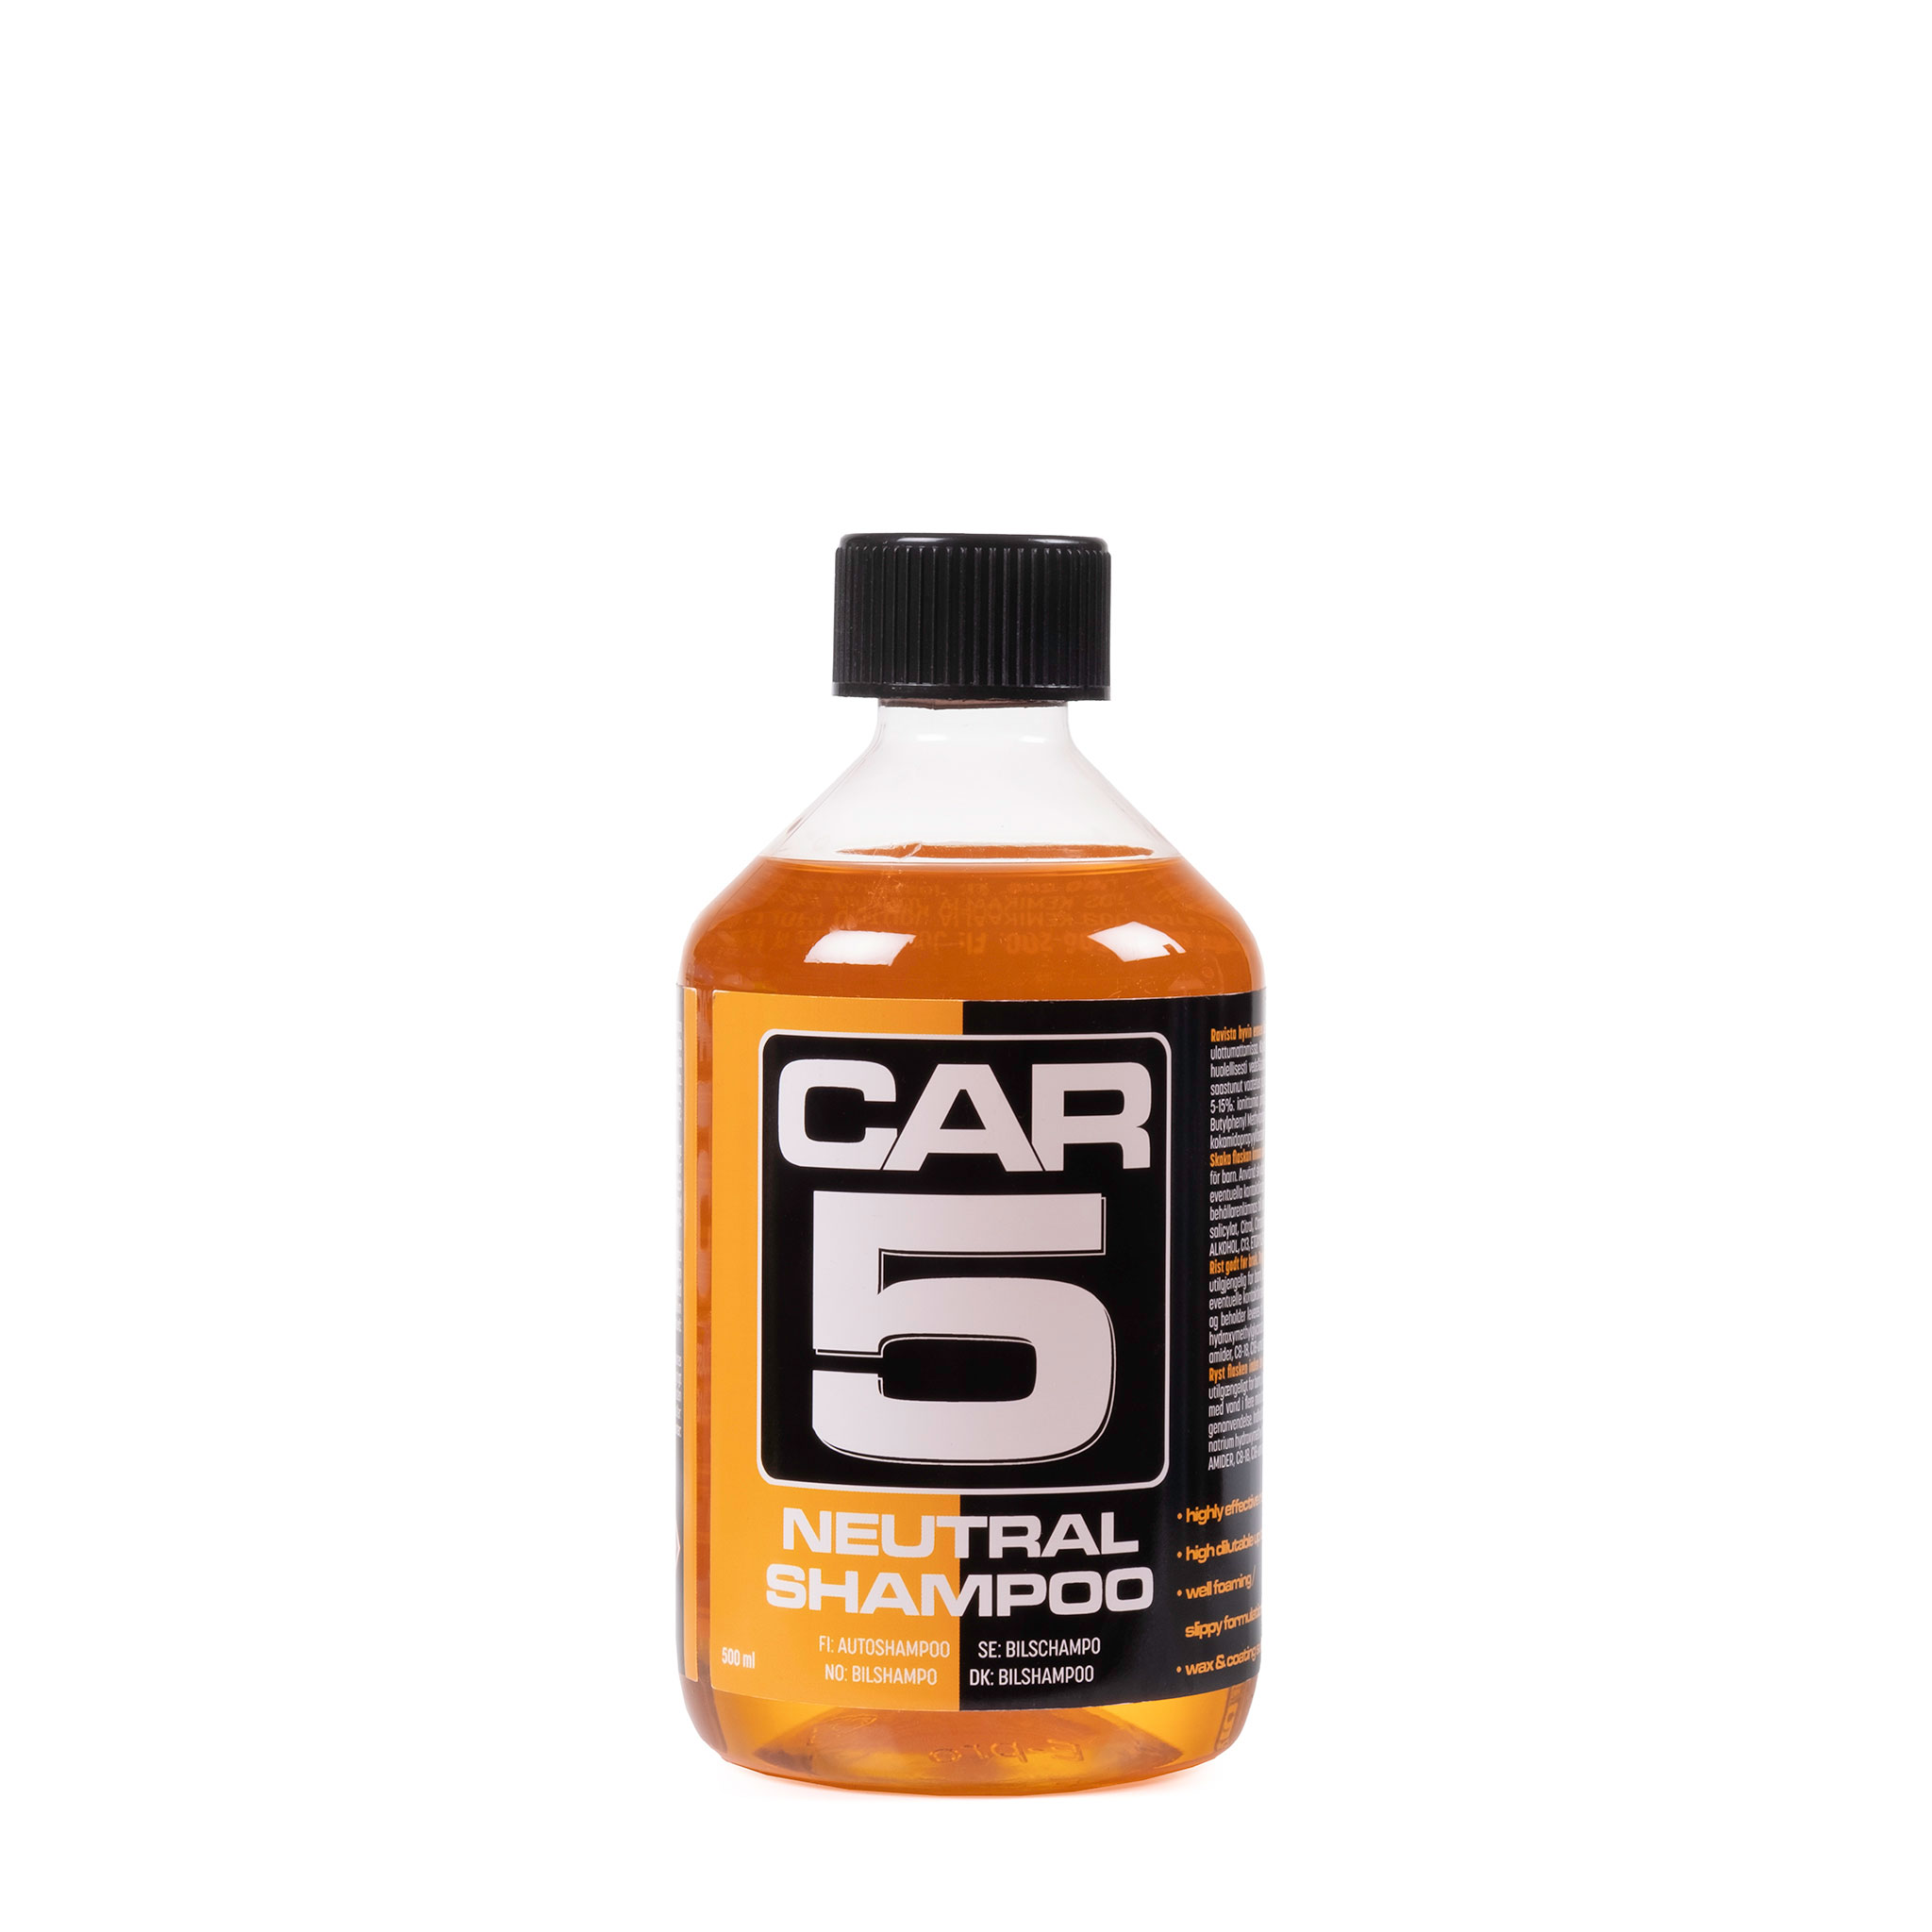 Bilschampo CAR5 Shampoo, 500 ml